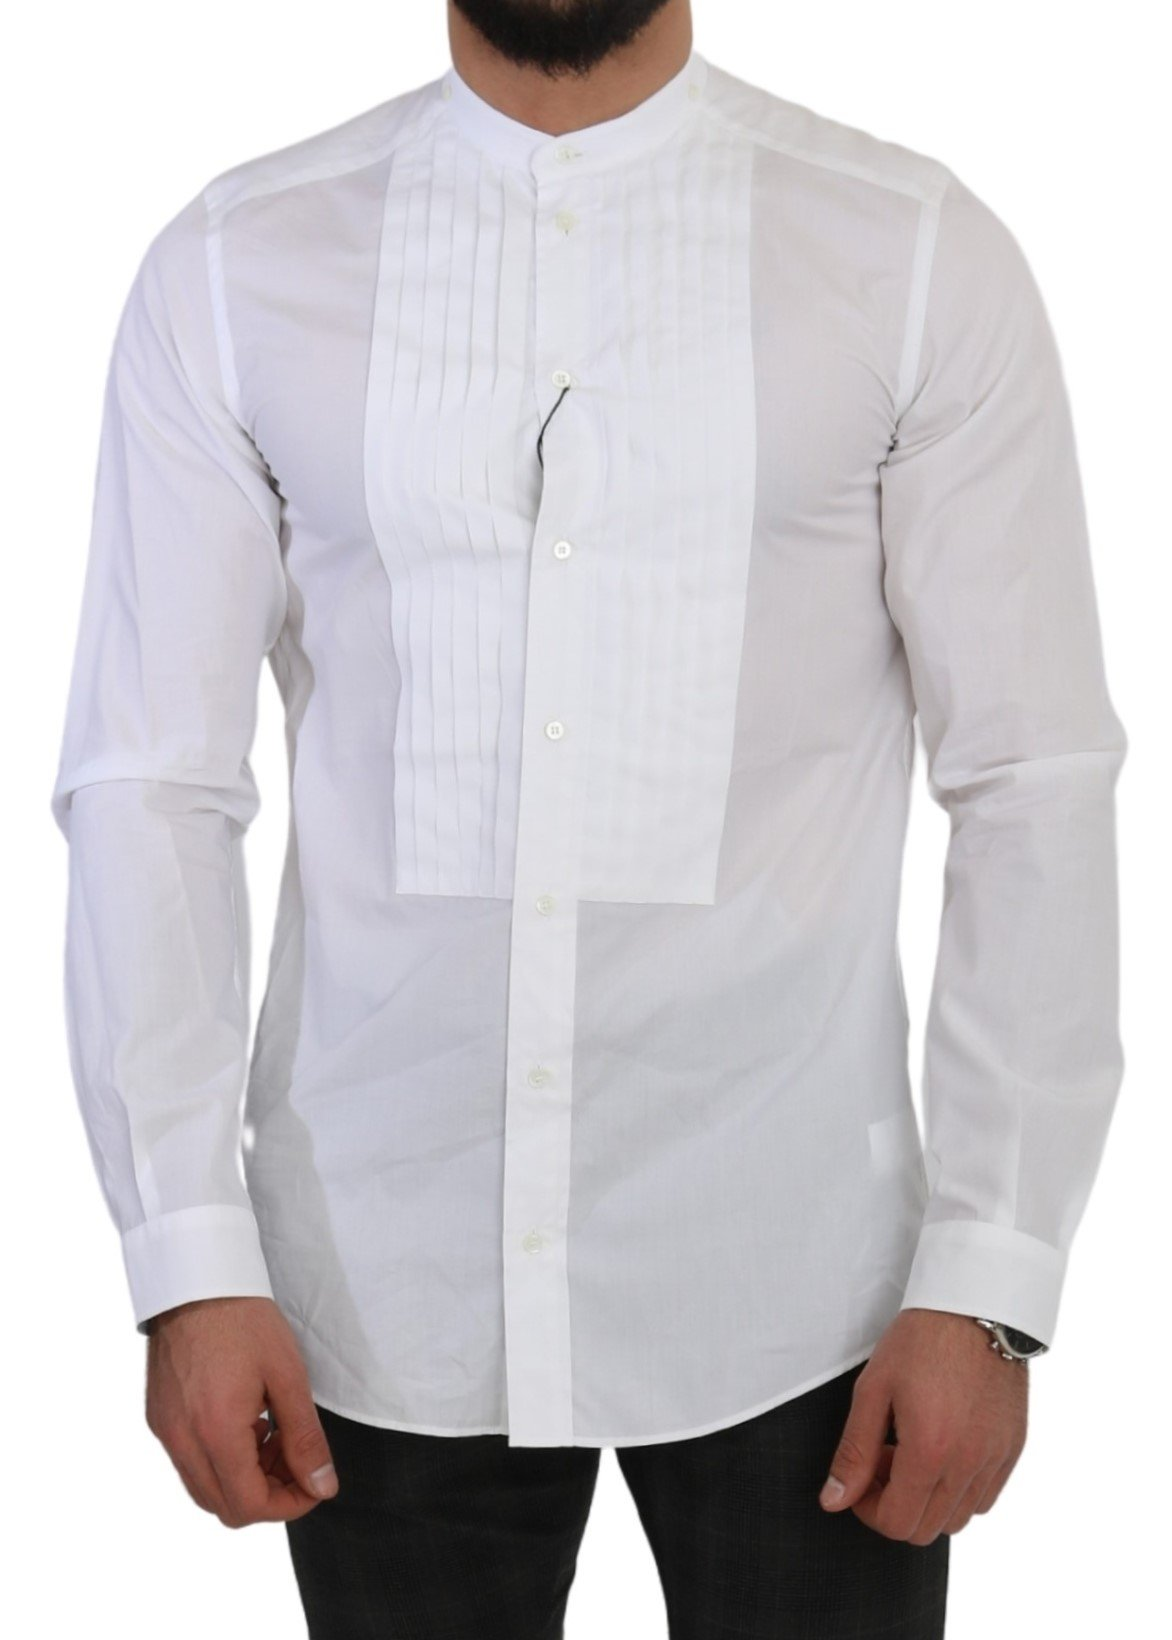 Dolce & Gabbana Men's Cotton Formal MARTINI Shirt White TSH5017 - IT39 | S